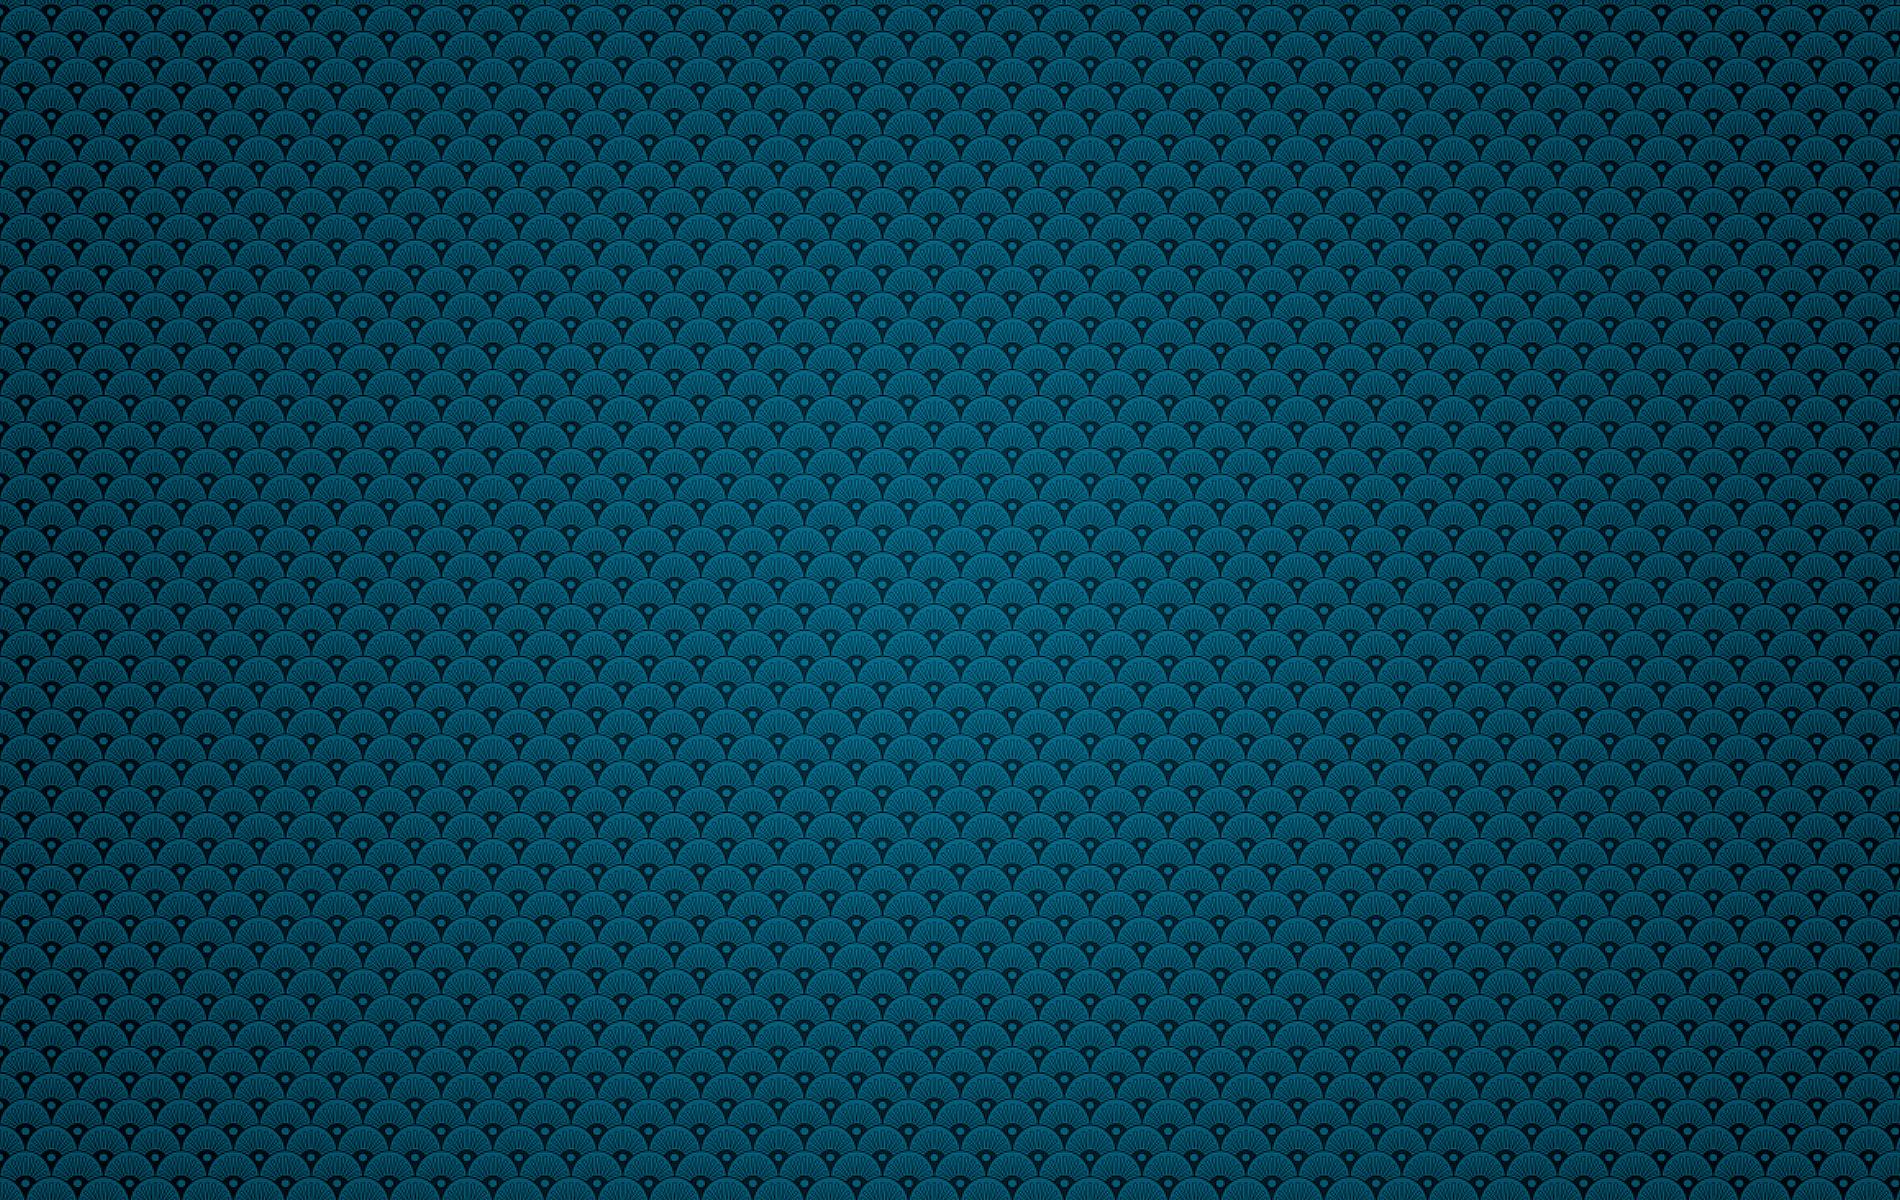 abstract desktop 19001200 wanted wallpaper 10 1900x1200